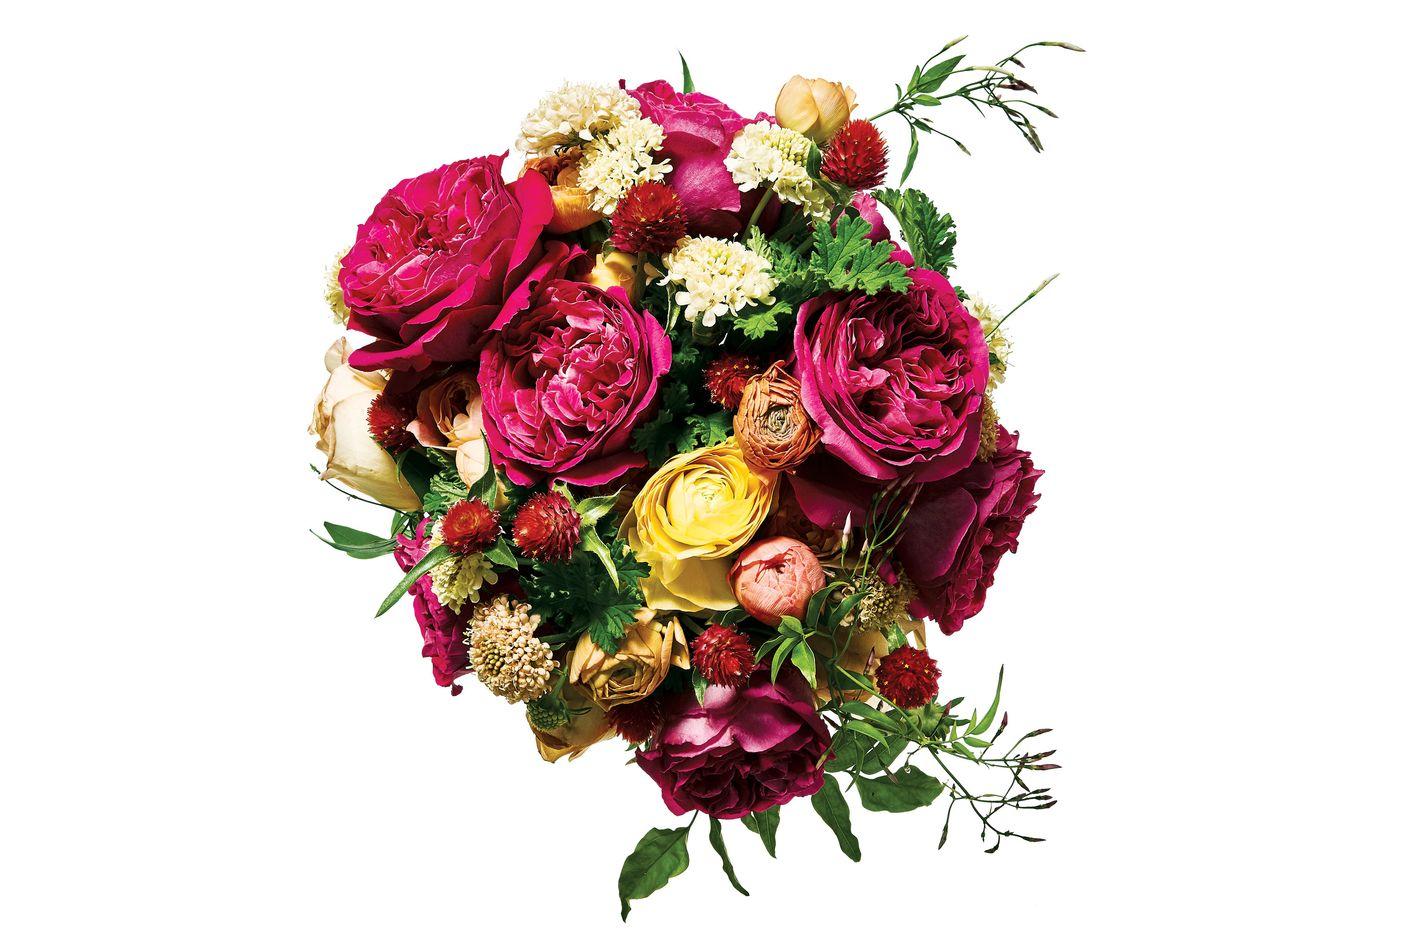 Scabiosa, garden rose, gomphrena, jasmine, geranium, and ranunculus